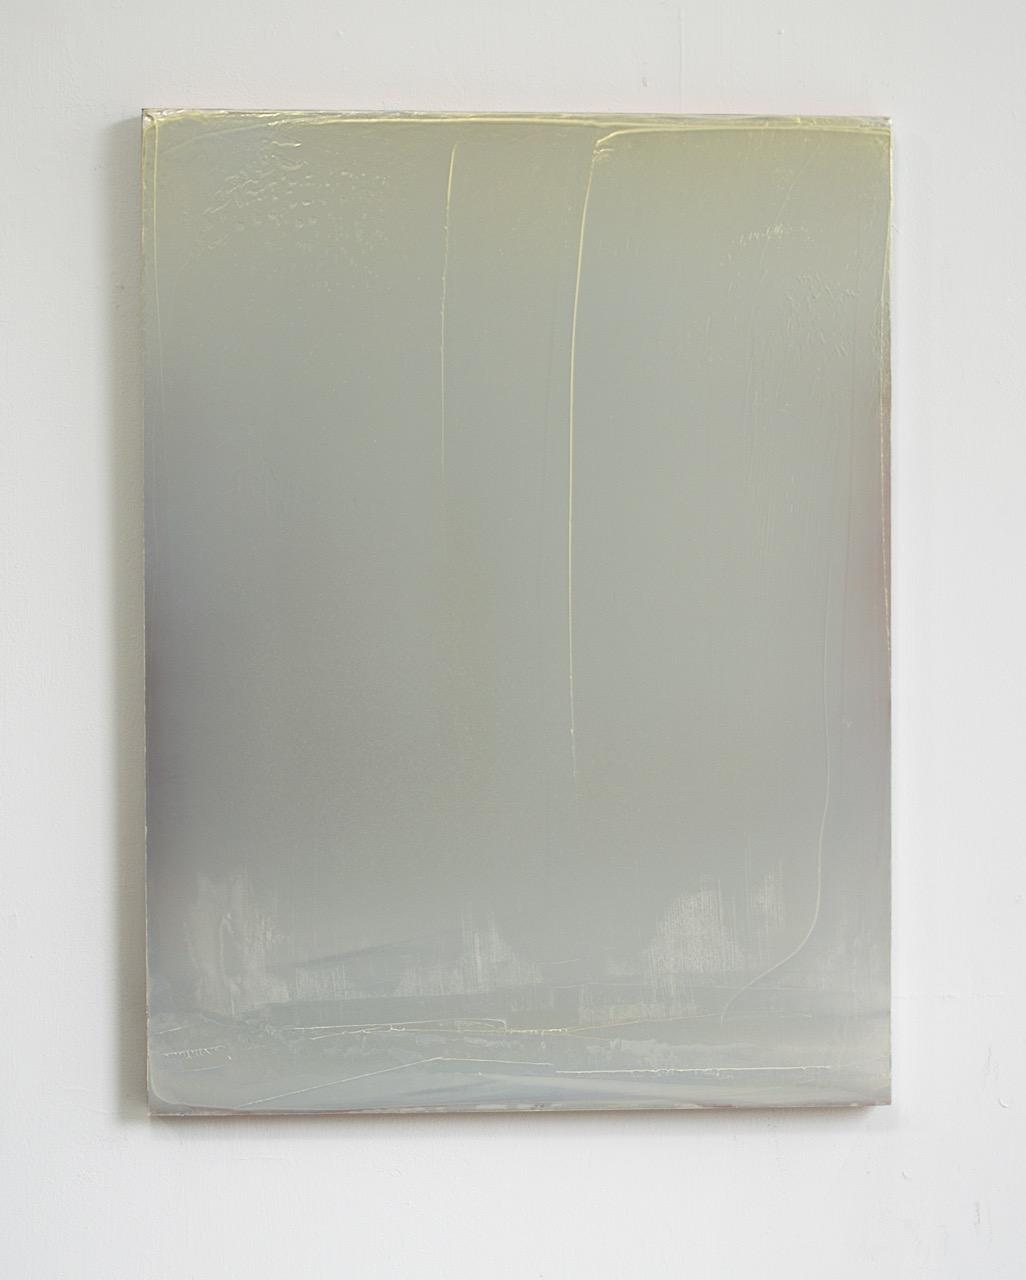 Untitled Gold over White, 2015, 60x45cm.jpg